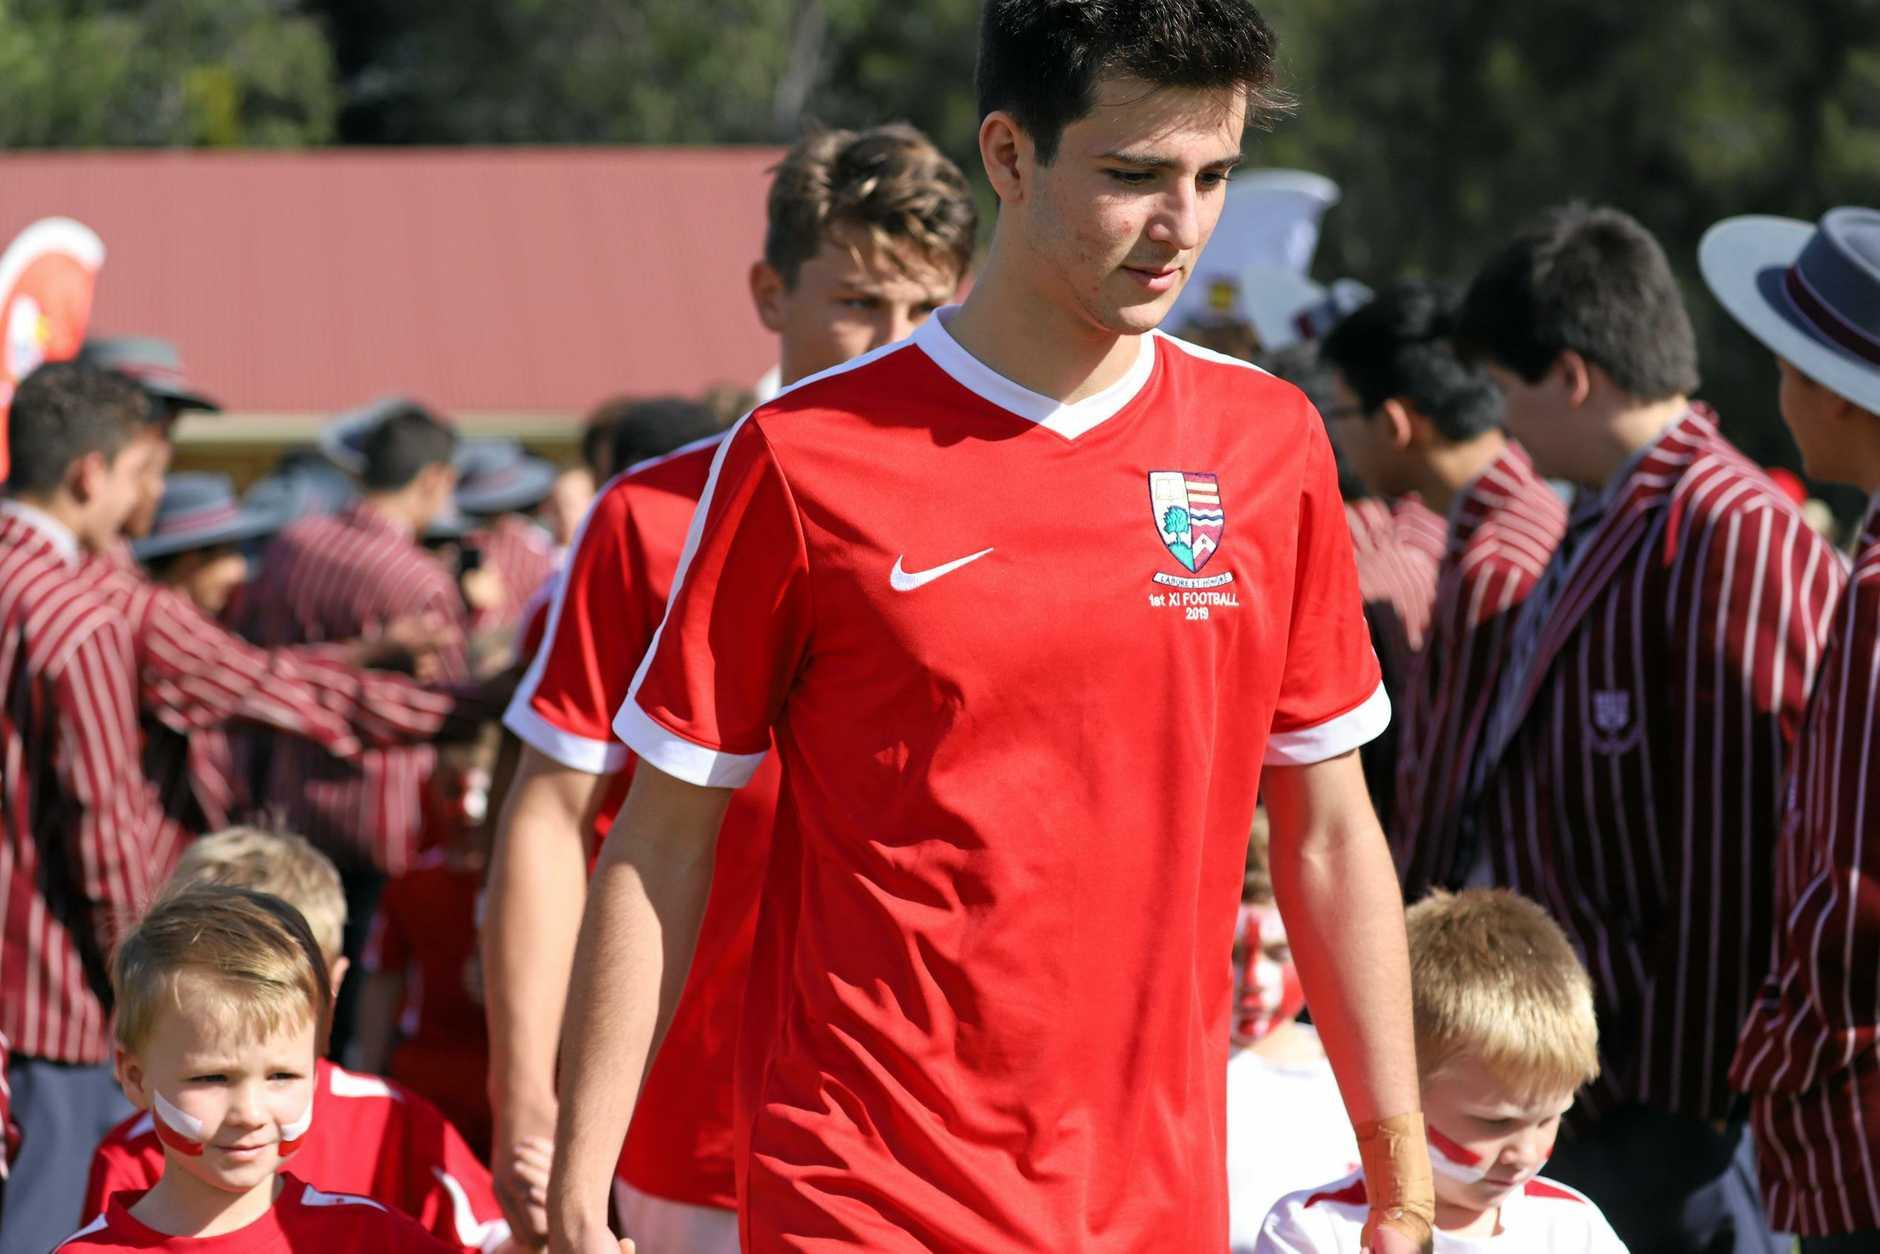 Ipswich Grammar School student Connor Maynard made a successful Western Pride senior team debut.